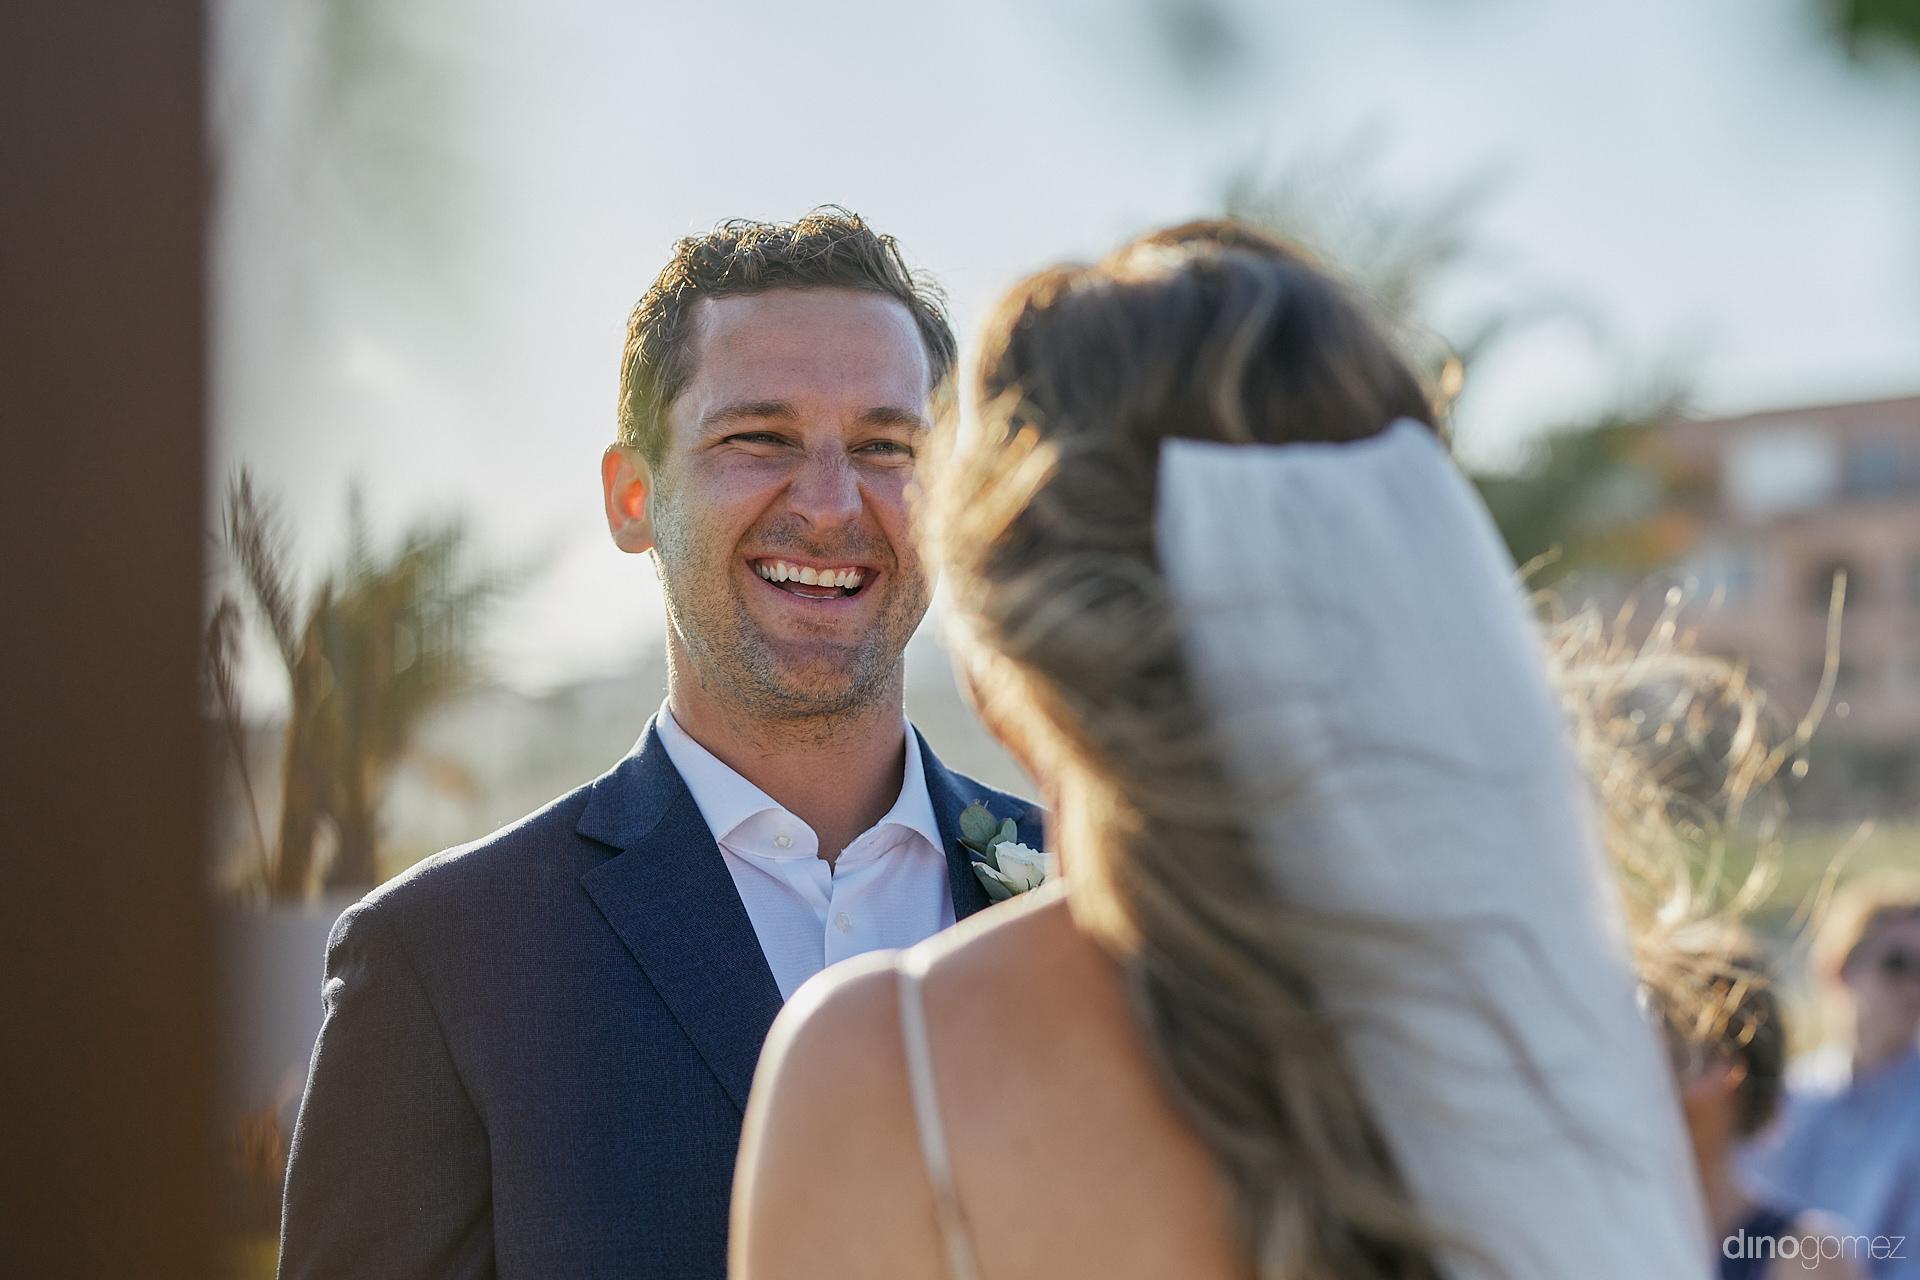 Los Cabos Wedding Planner - Luxury Wedding Photographer In Cabo Dino Gomez - C&T